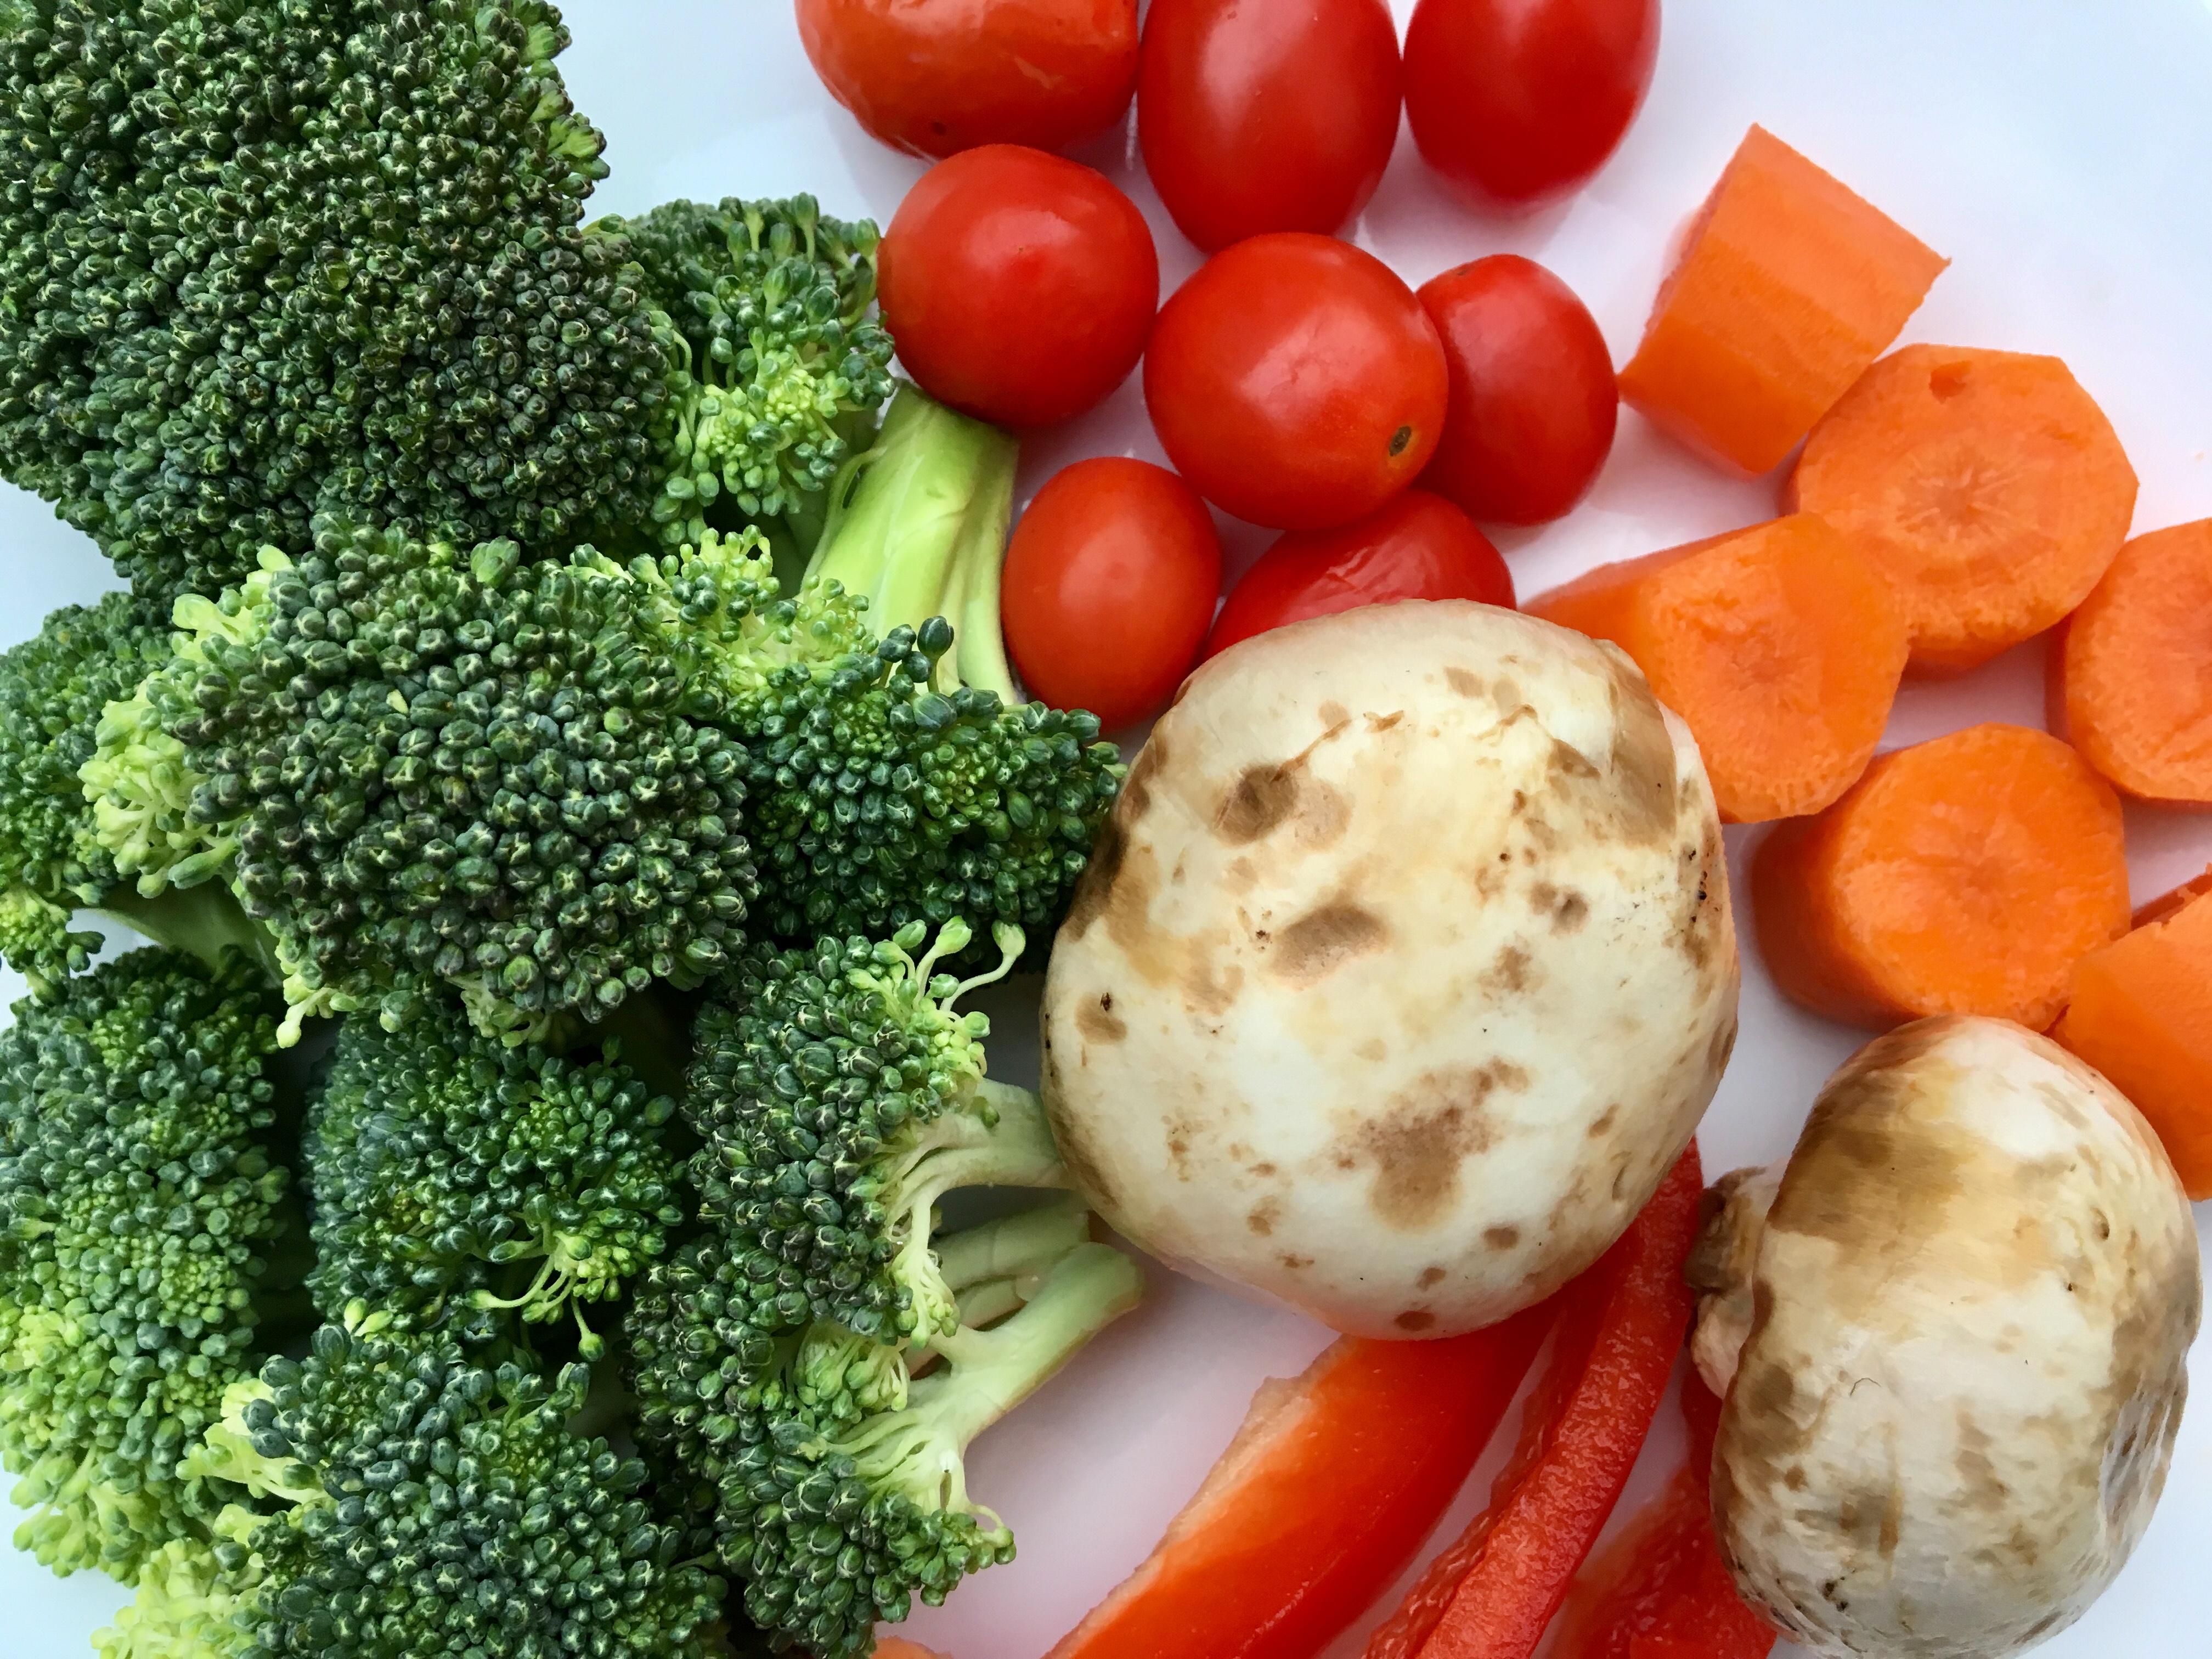 Healthy Snacks, veggies